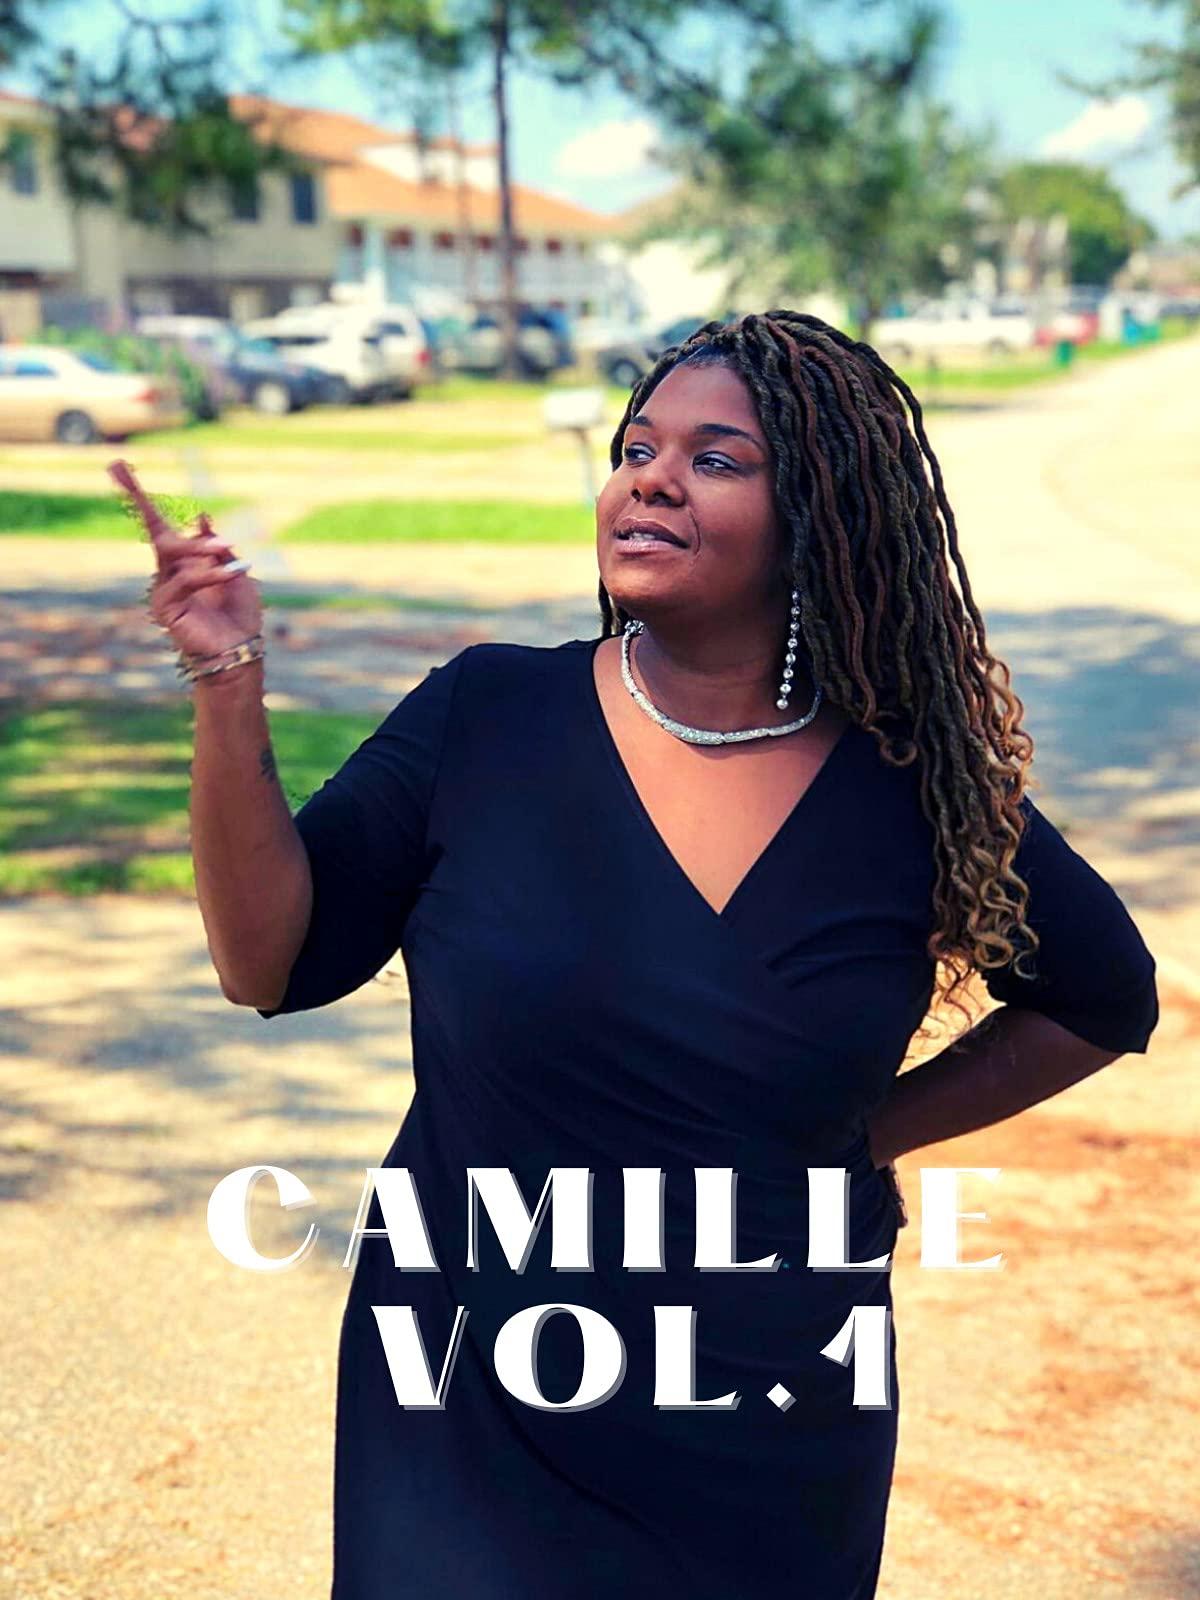 Camille Vol.1 on Amazon Prime Video UK